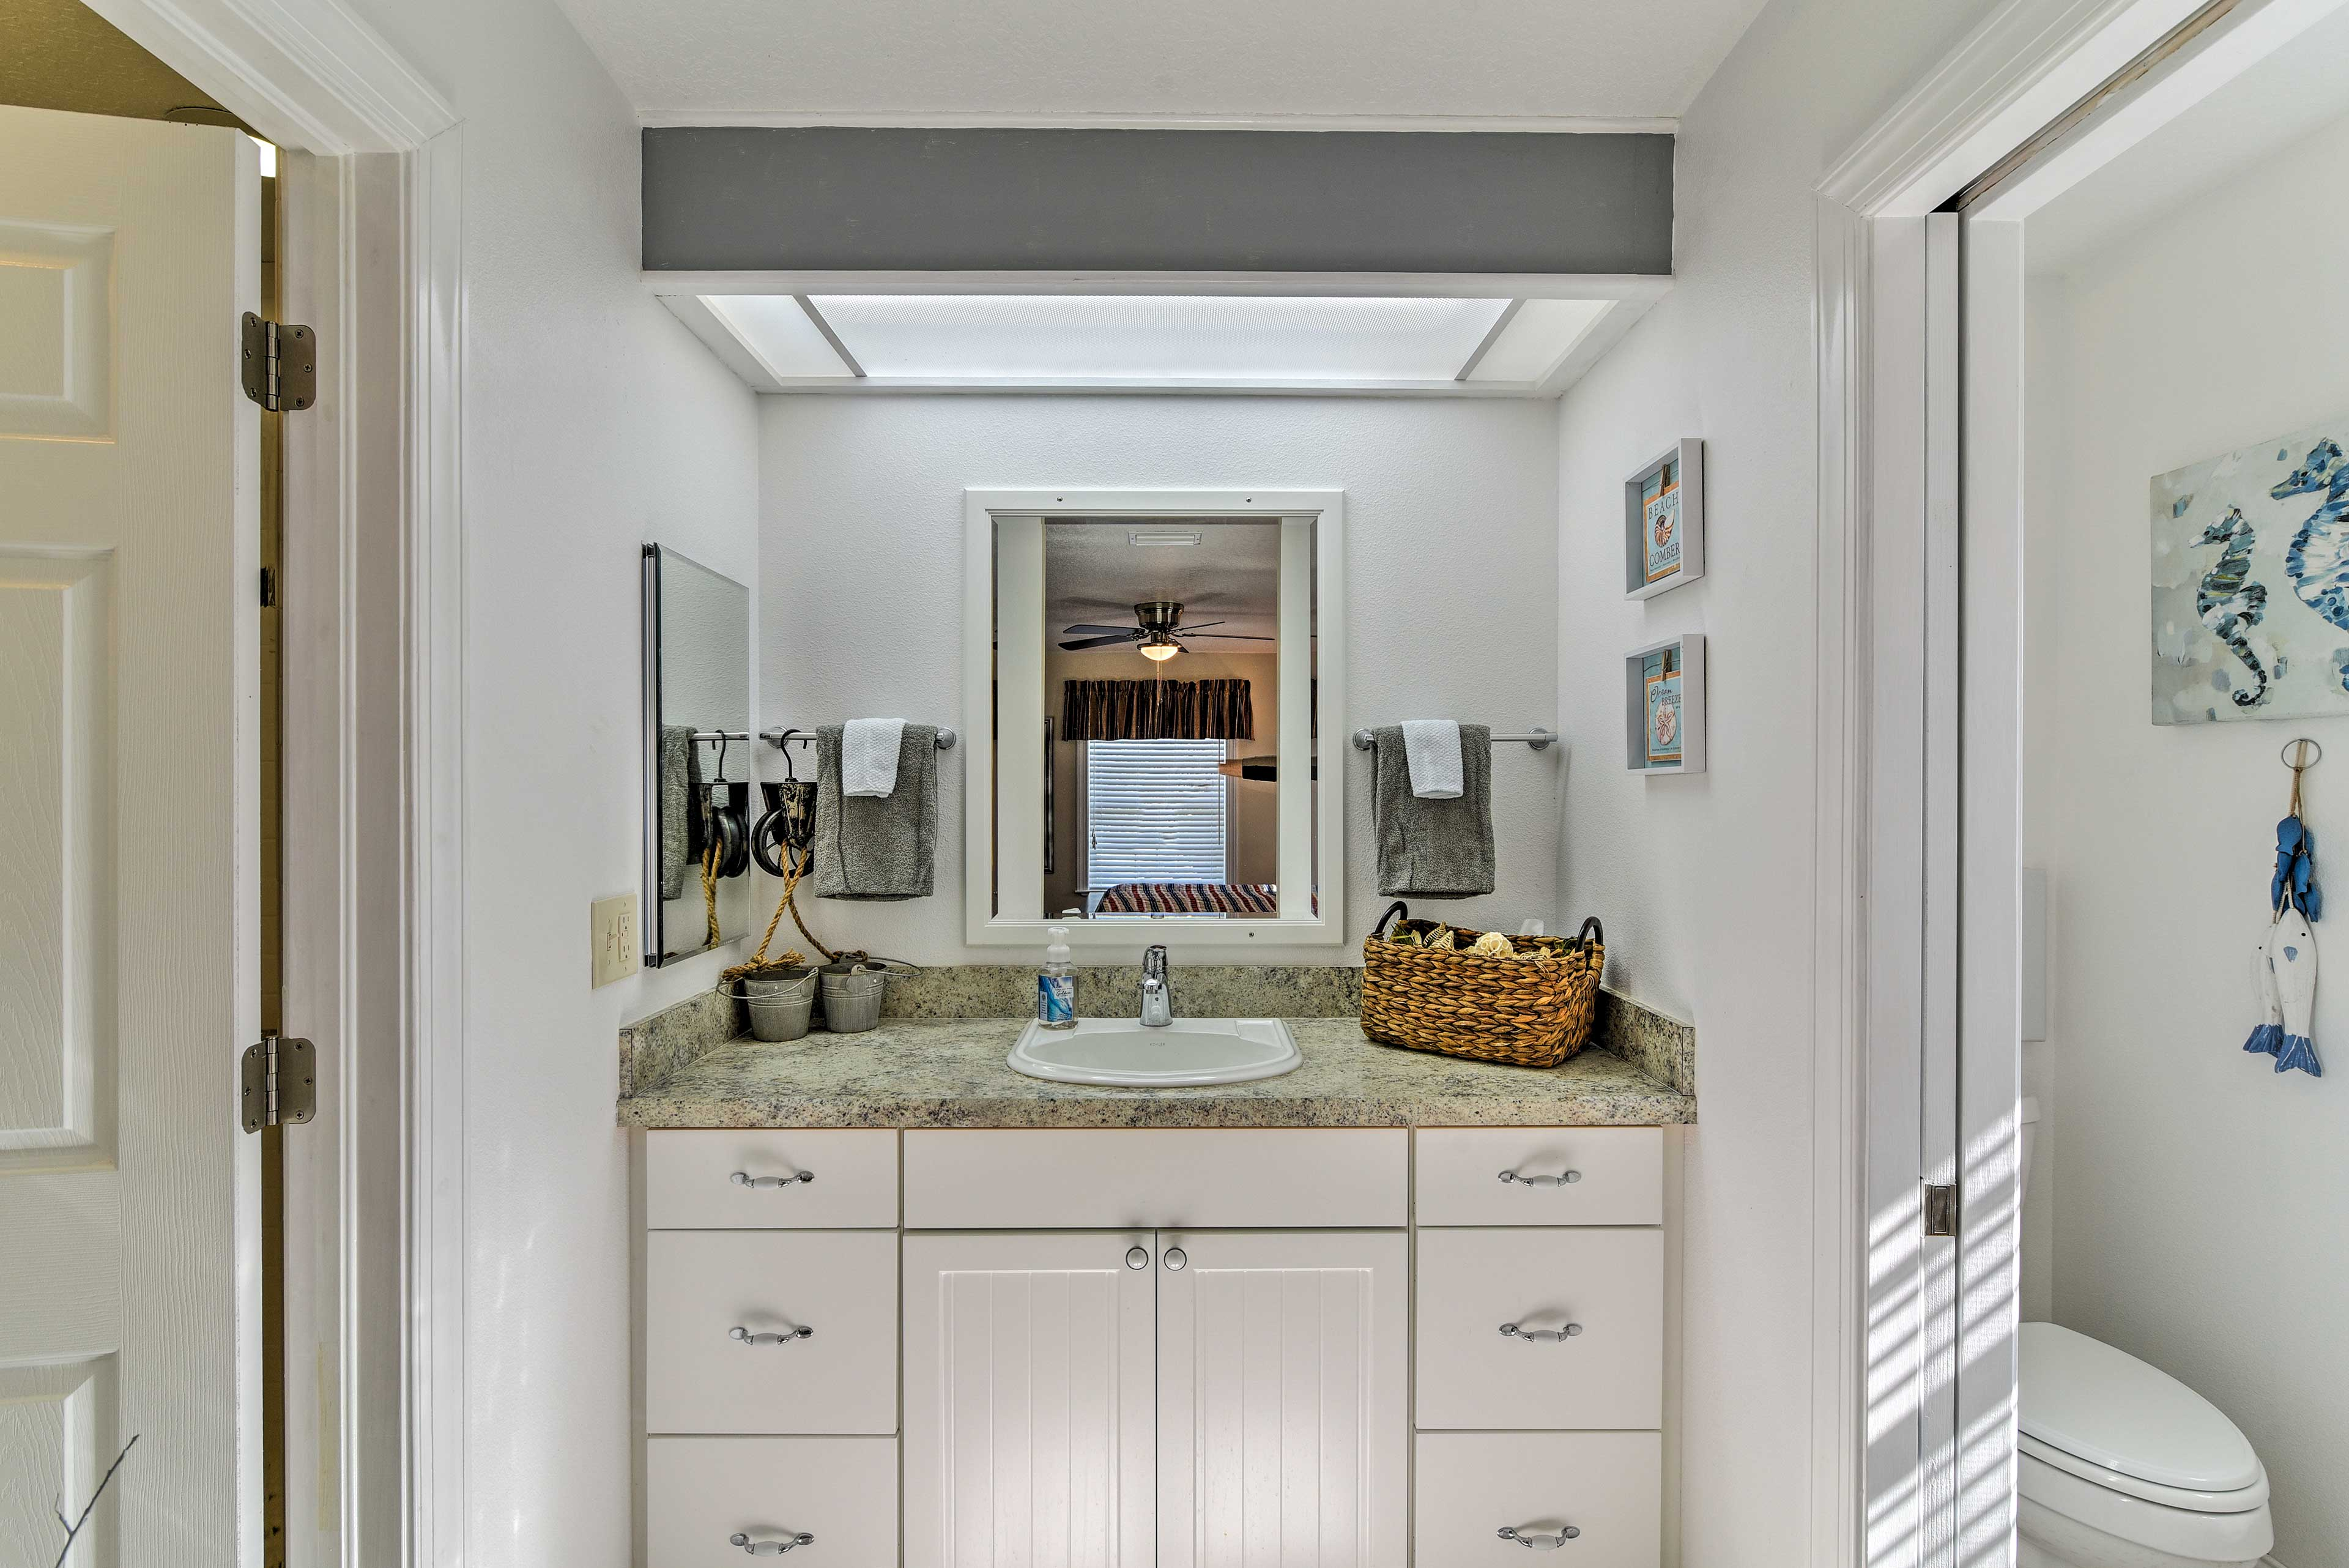 Wash off in privacy with the en-suite bathroom.